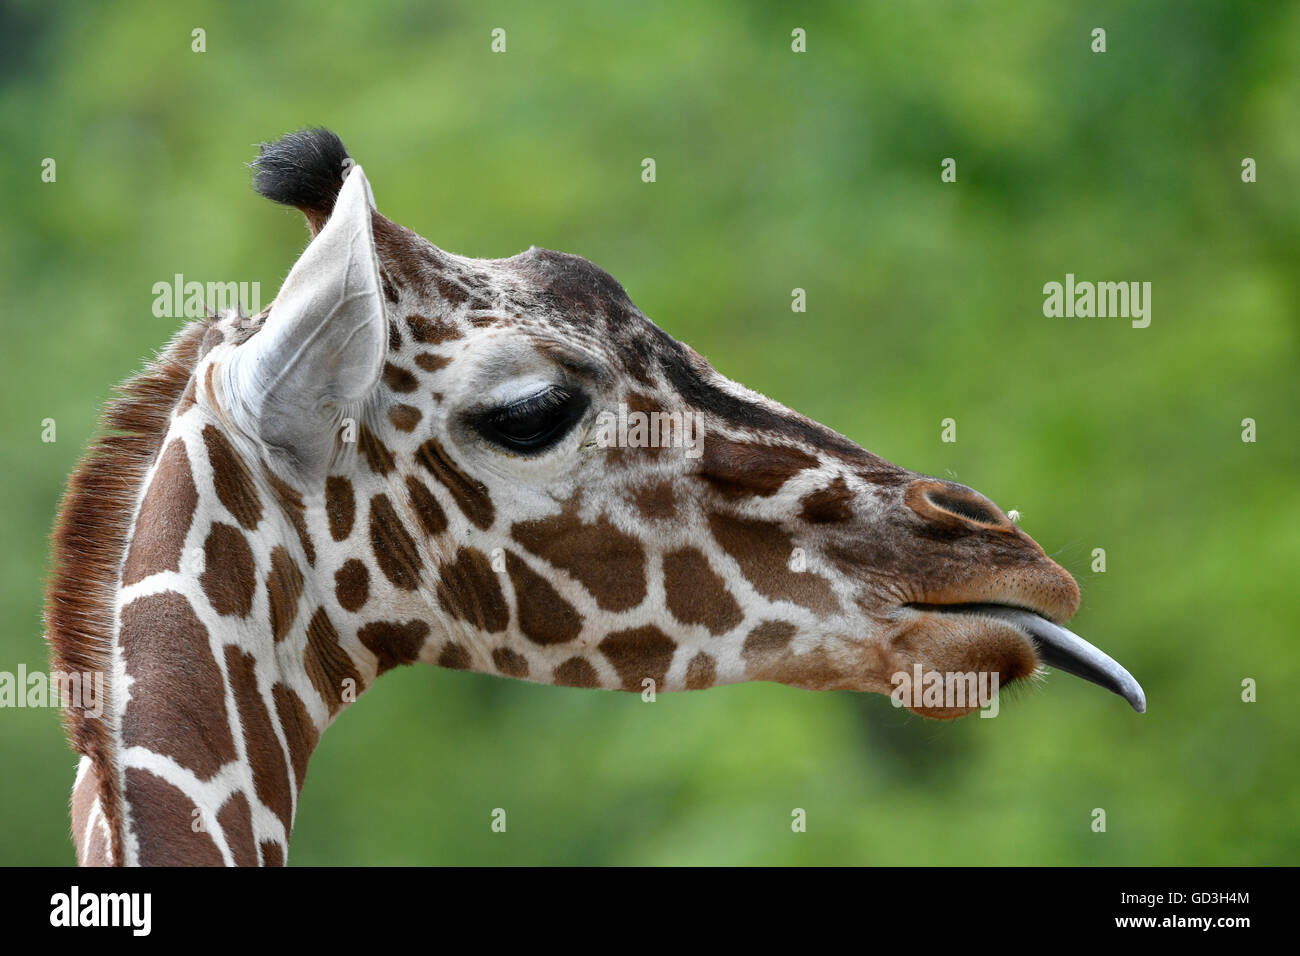 Giraffe réticulée (Giraffa camelopardalis reticulata), portrait, tire la langue, captive Photo Stock